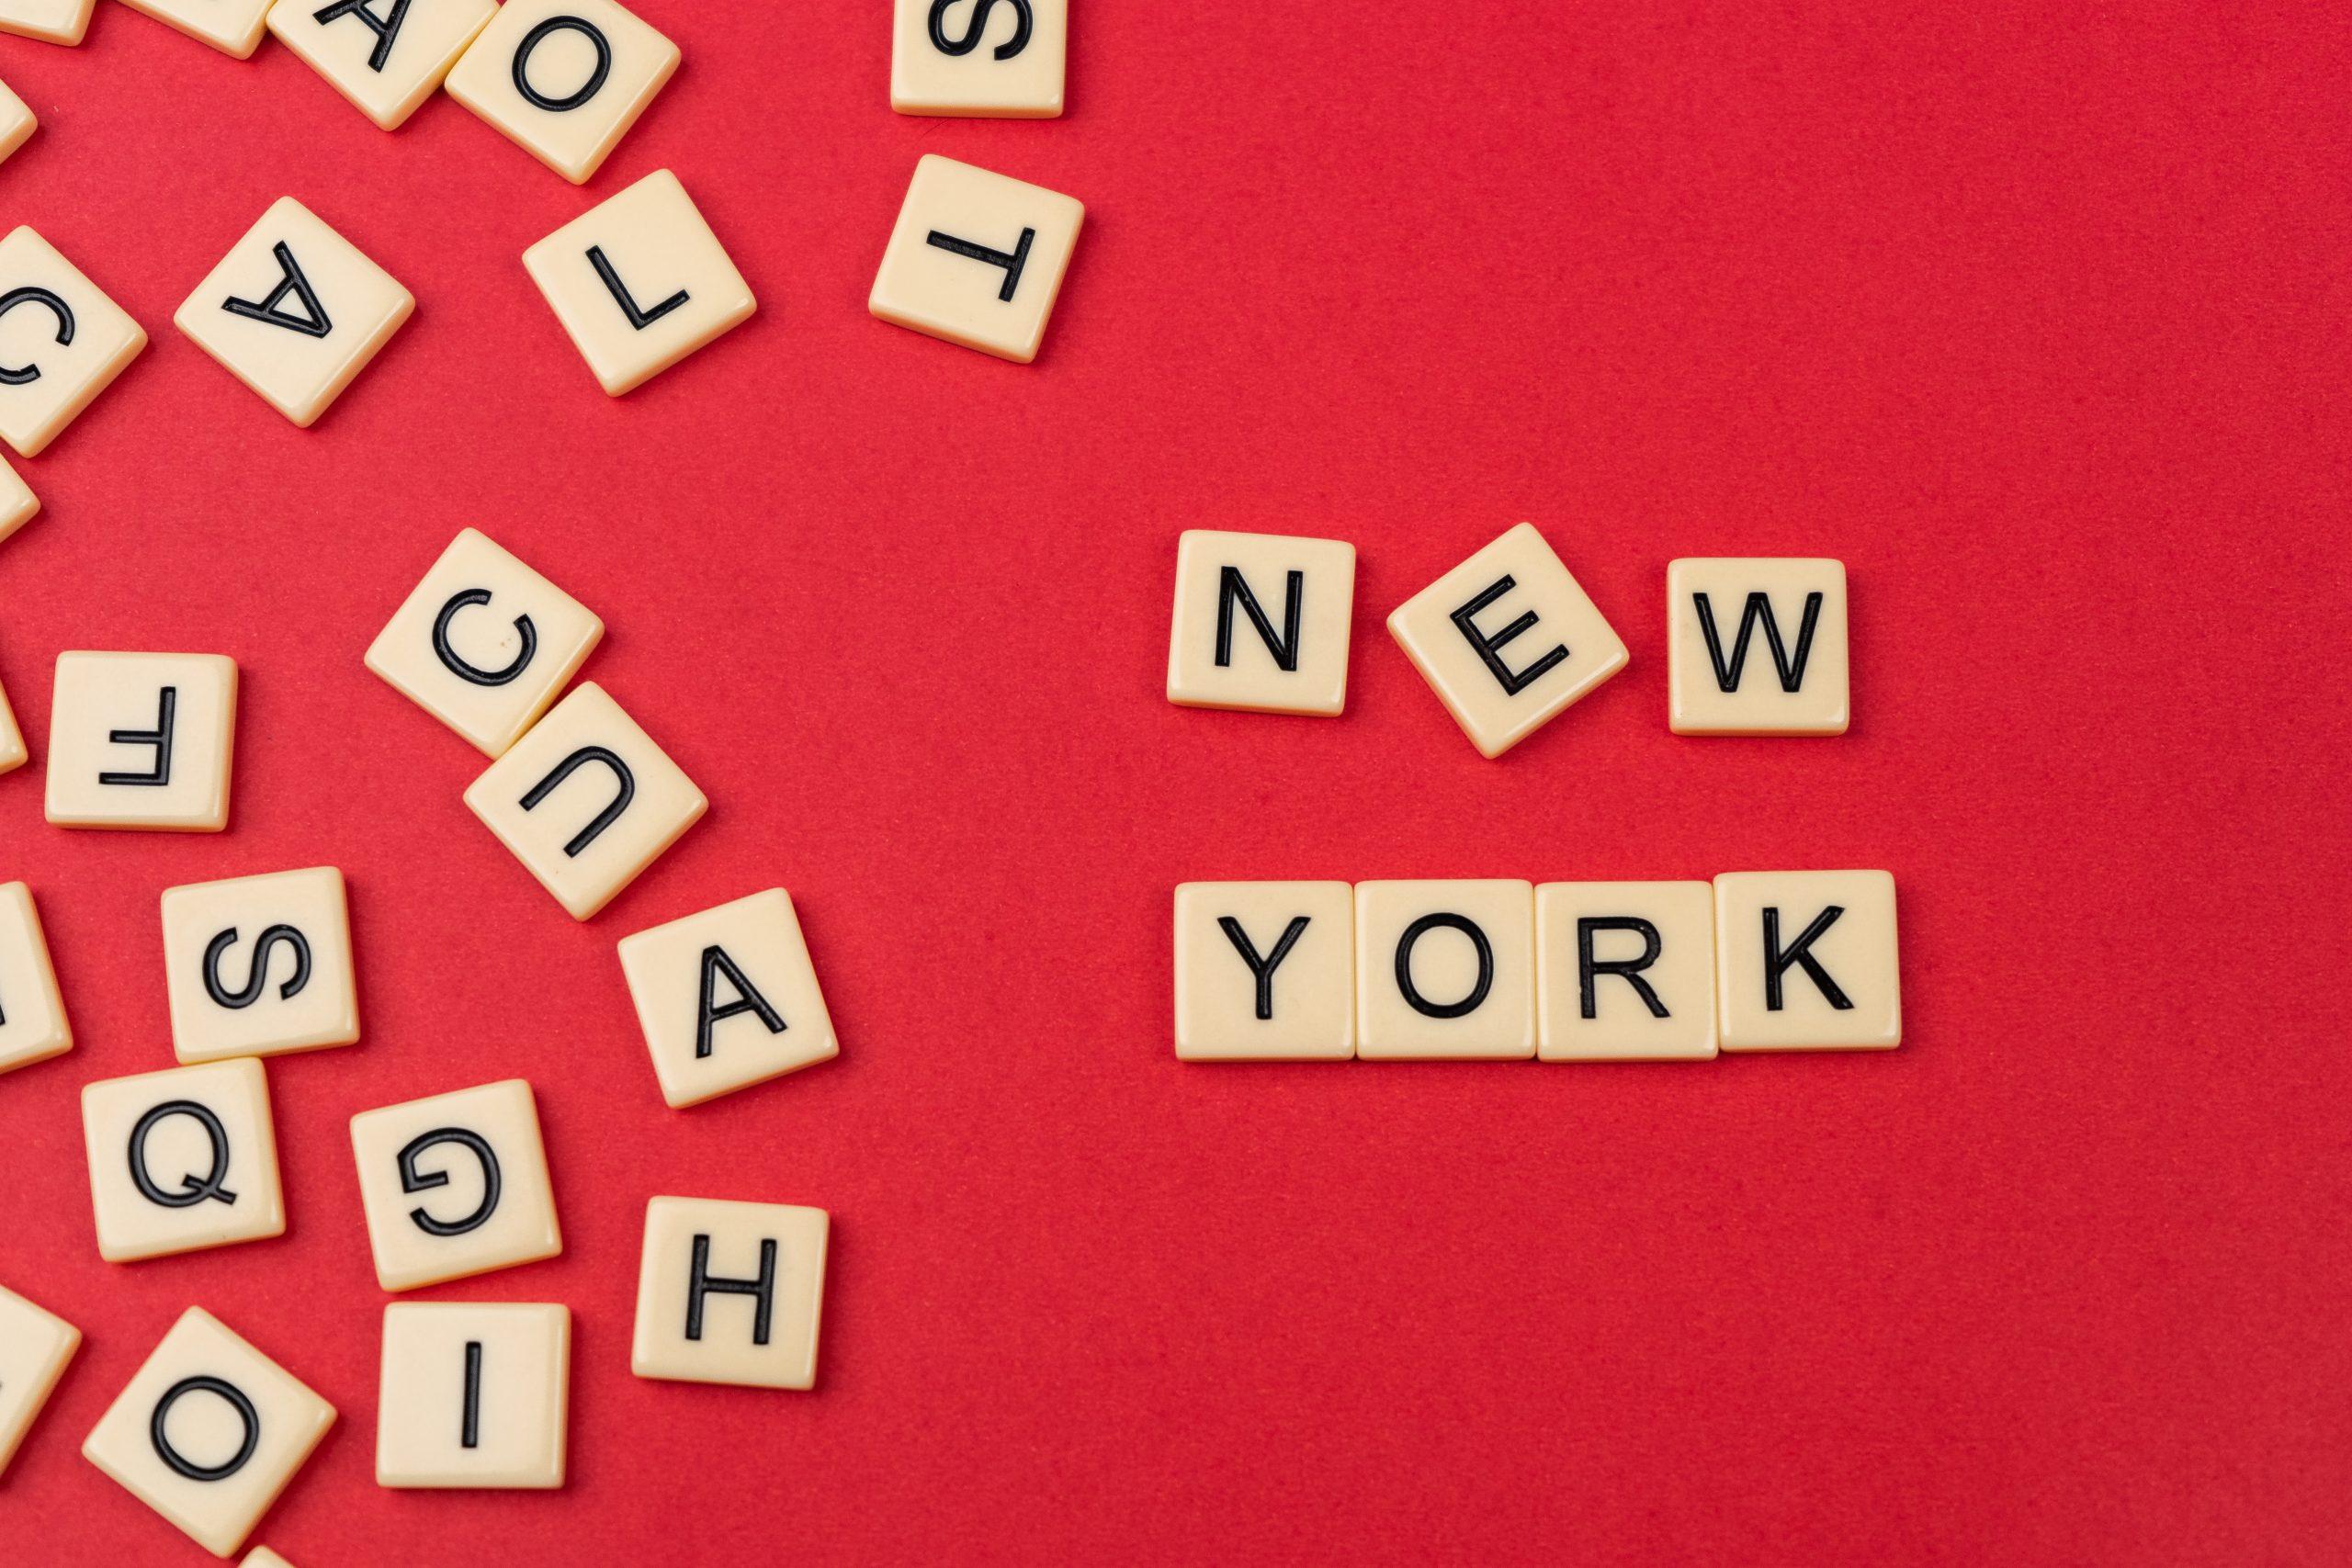 New York written on scrabble